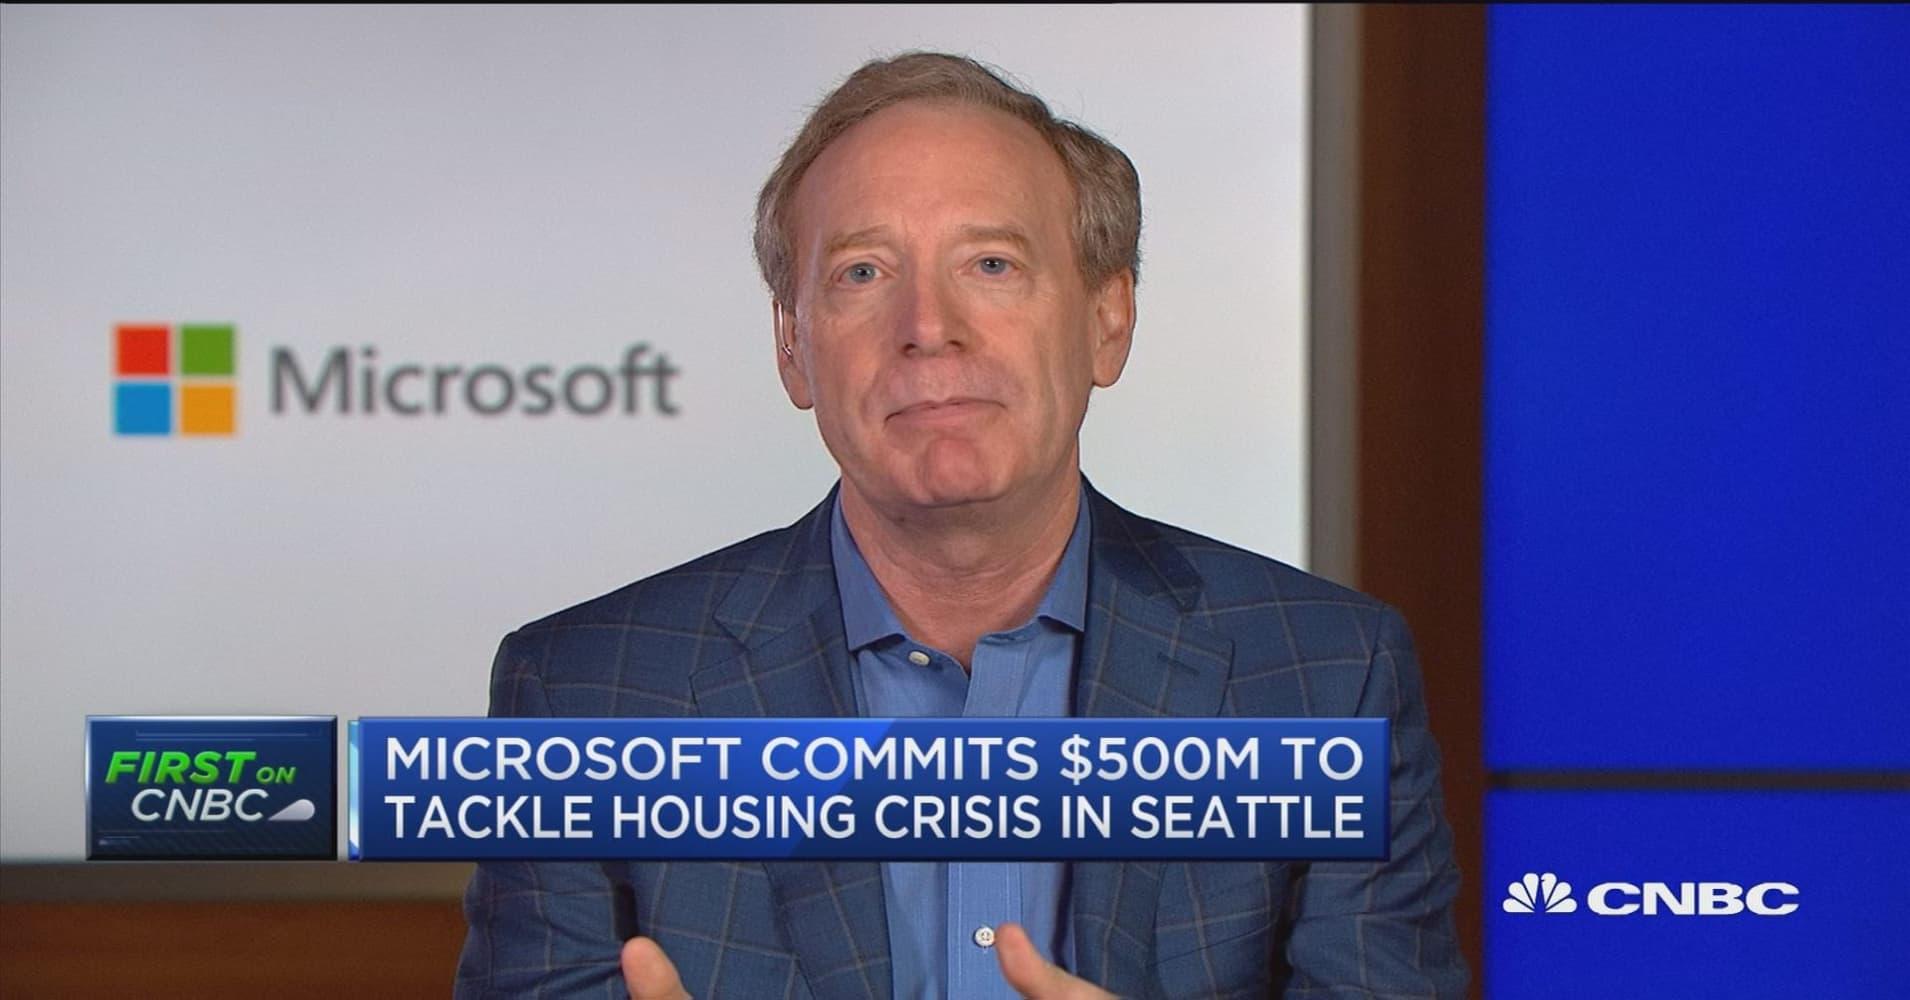 Housing pledge driven by responsibility, gratitude, says Microsoft president